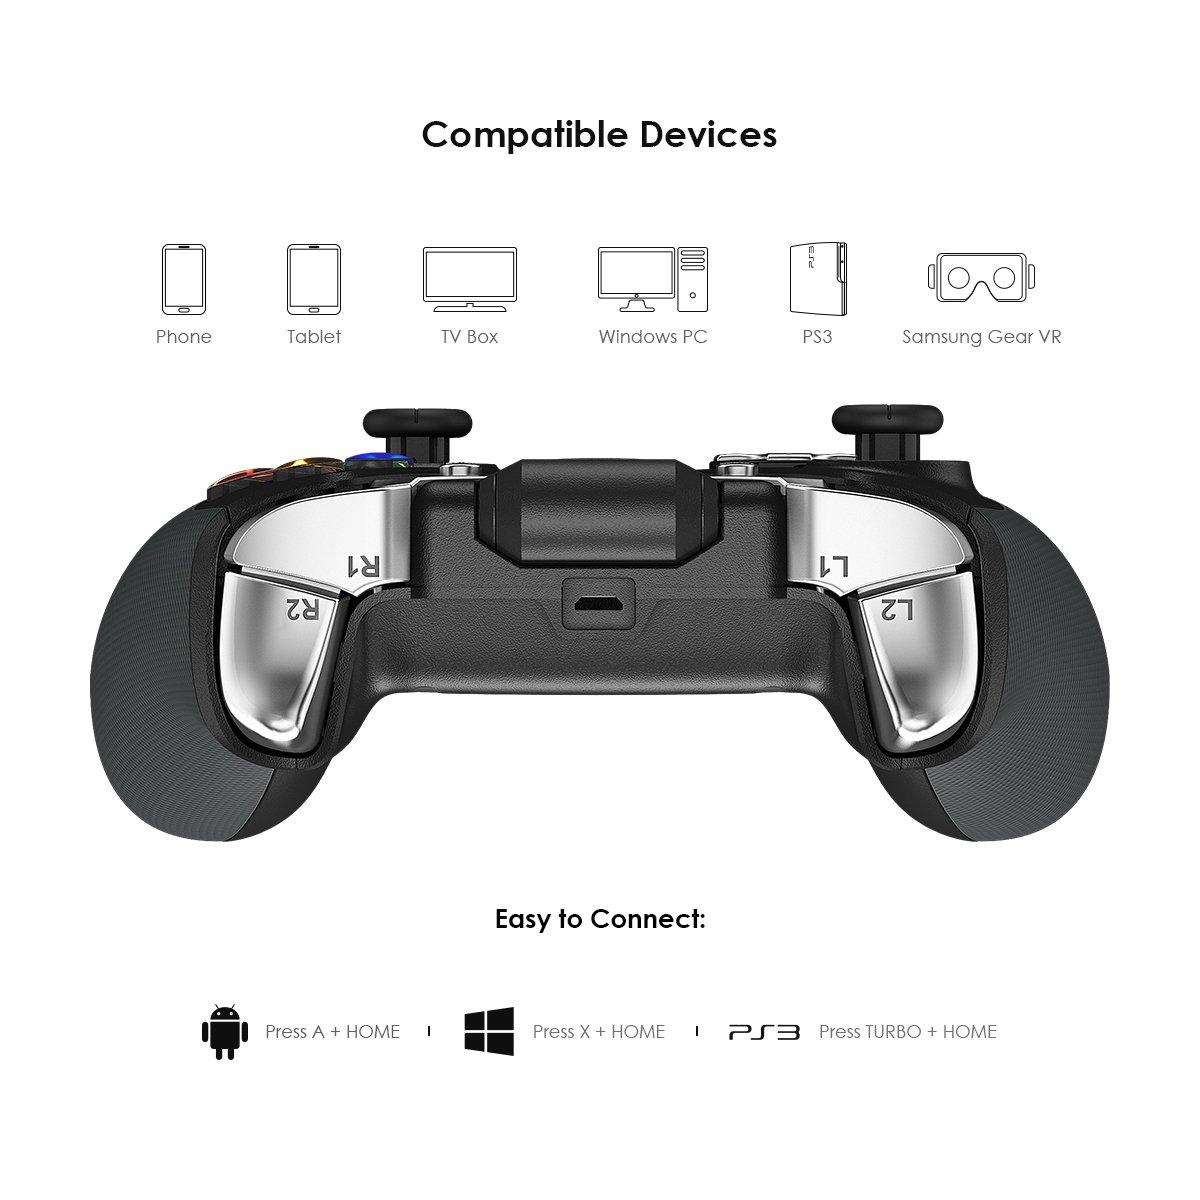 GameSir G4 Controlador Bluetooth Inalámbrico, Joystick Gamepad para Android Teléfono/TV Box/Samsung Gear VR / Windows7,8,8.1,10/ Oculus: Amazon.es: ...